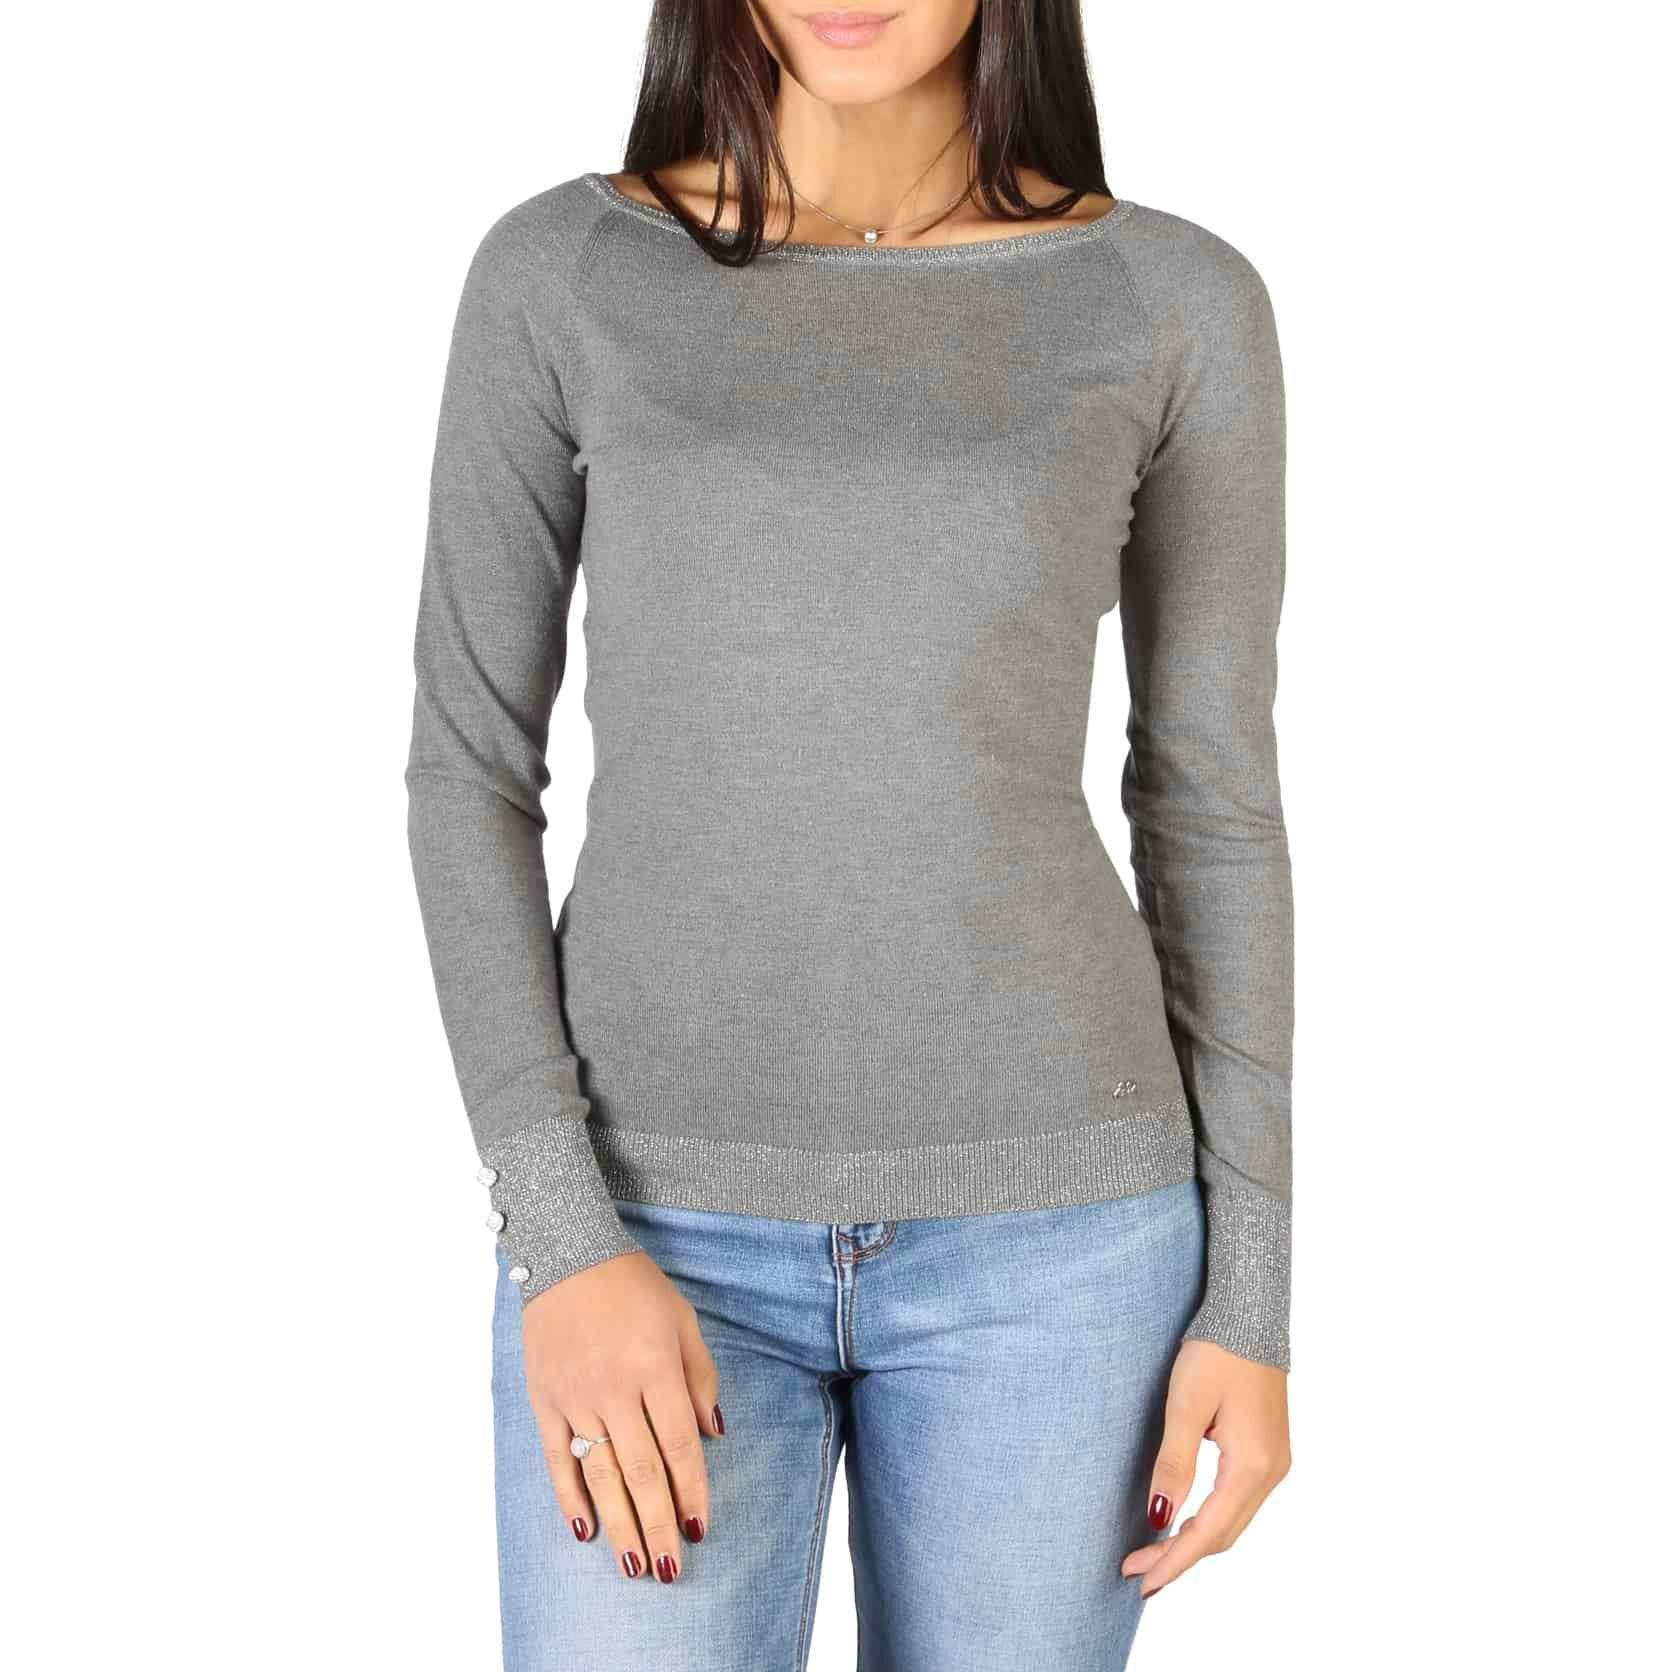 Yes Zee - Sweaters For Women Grey - 1635_M031_BG00